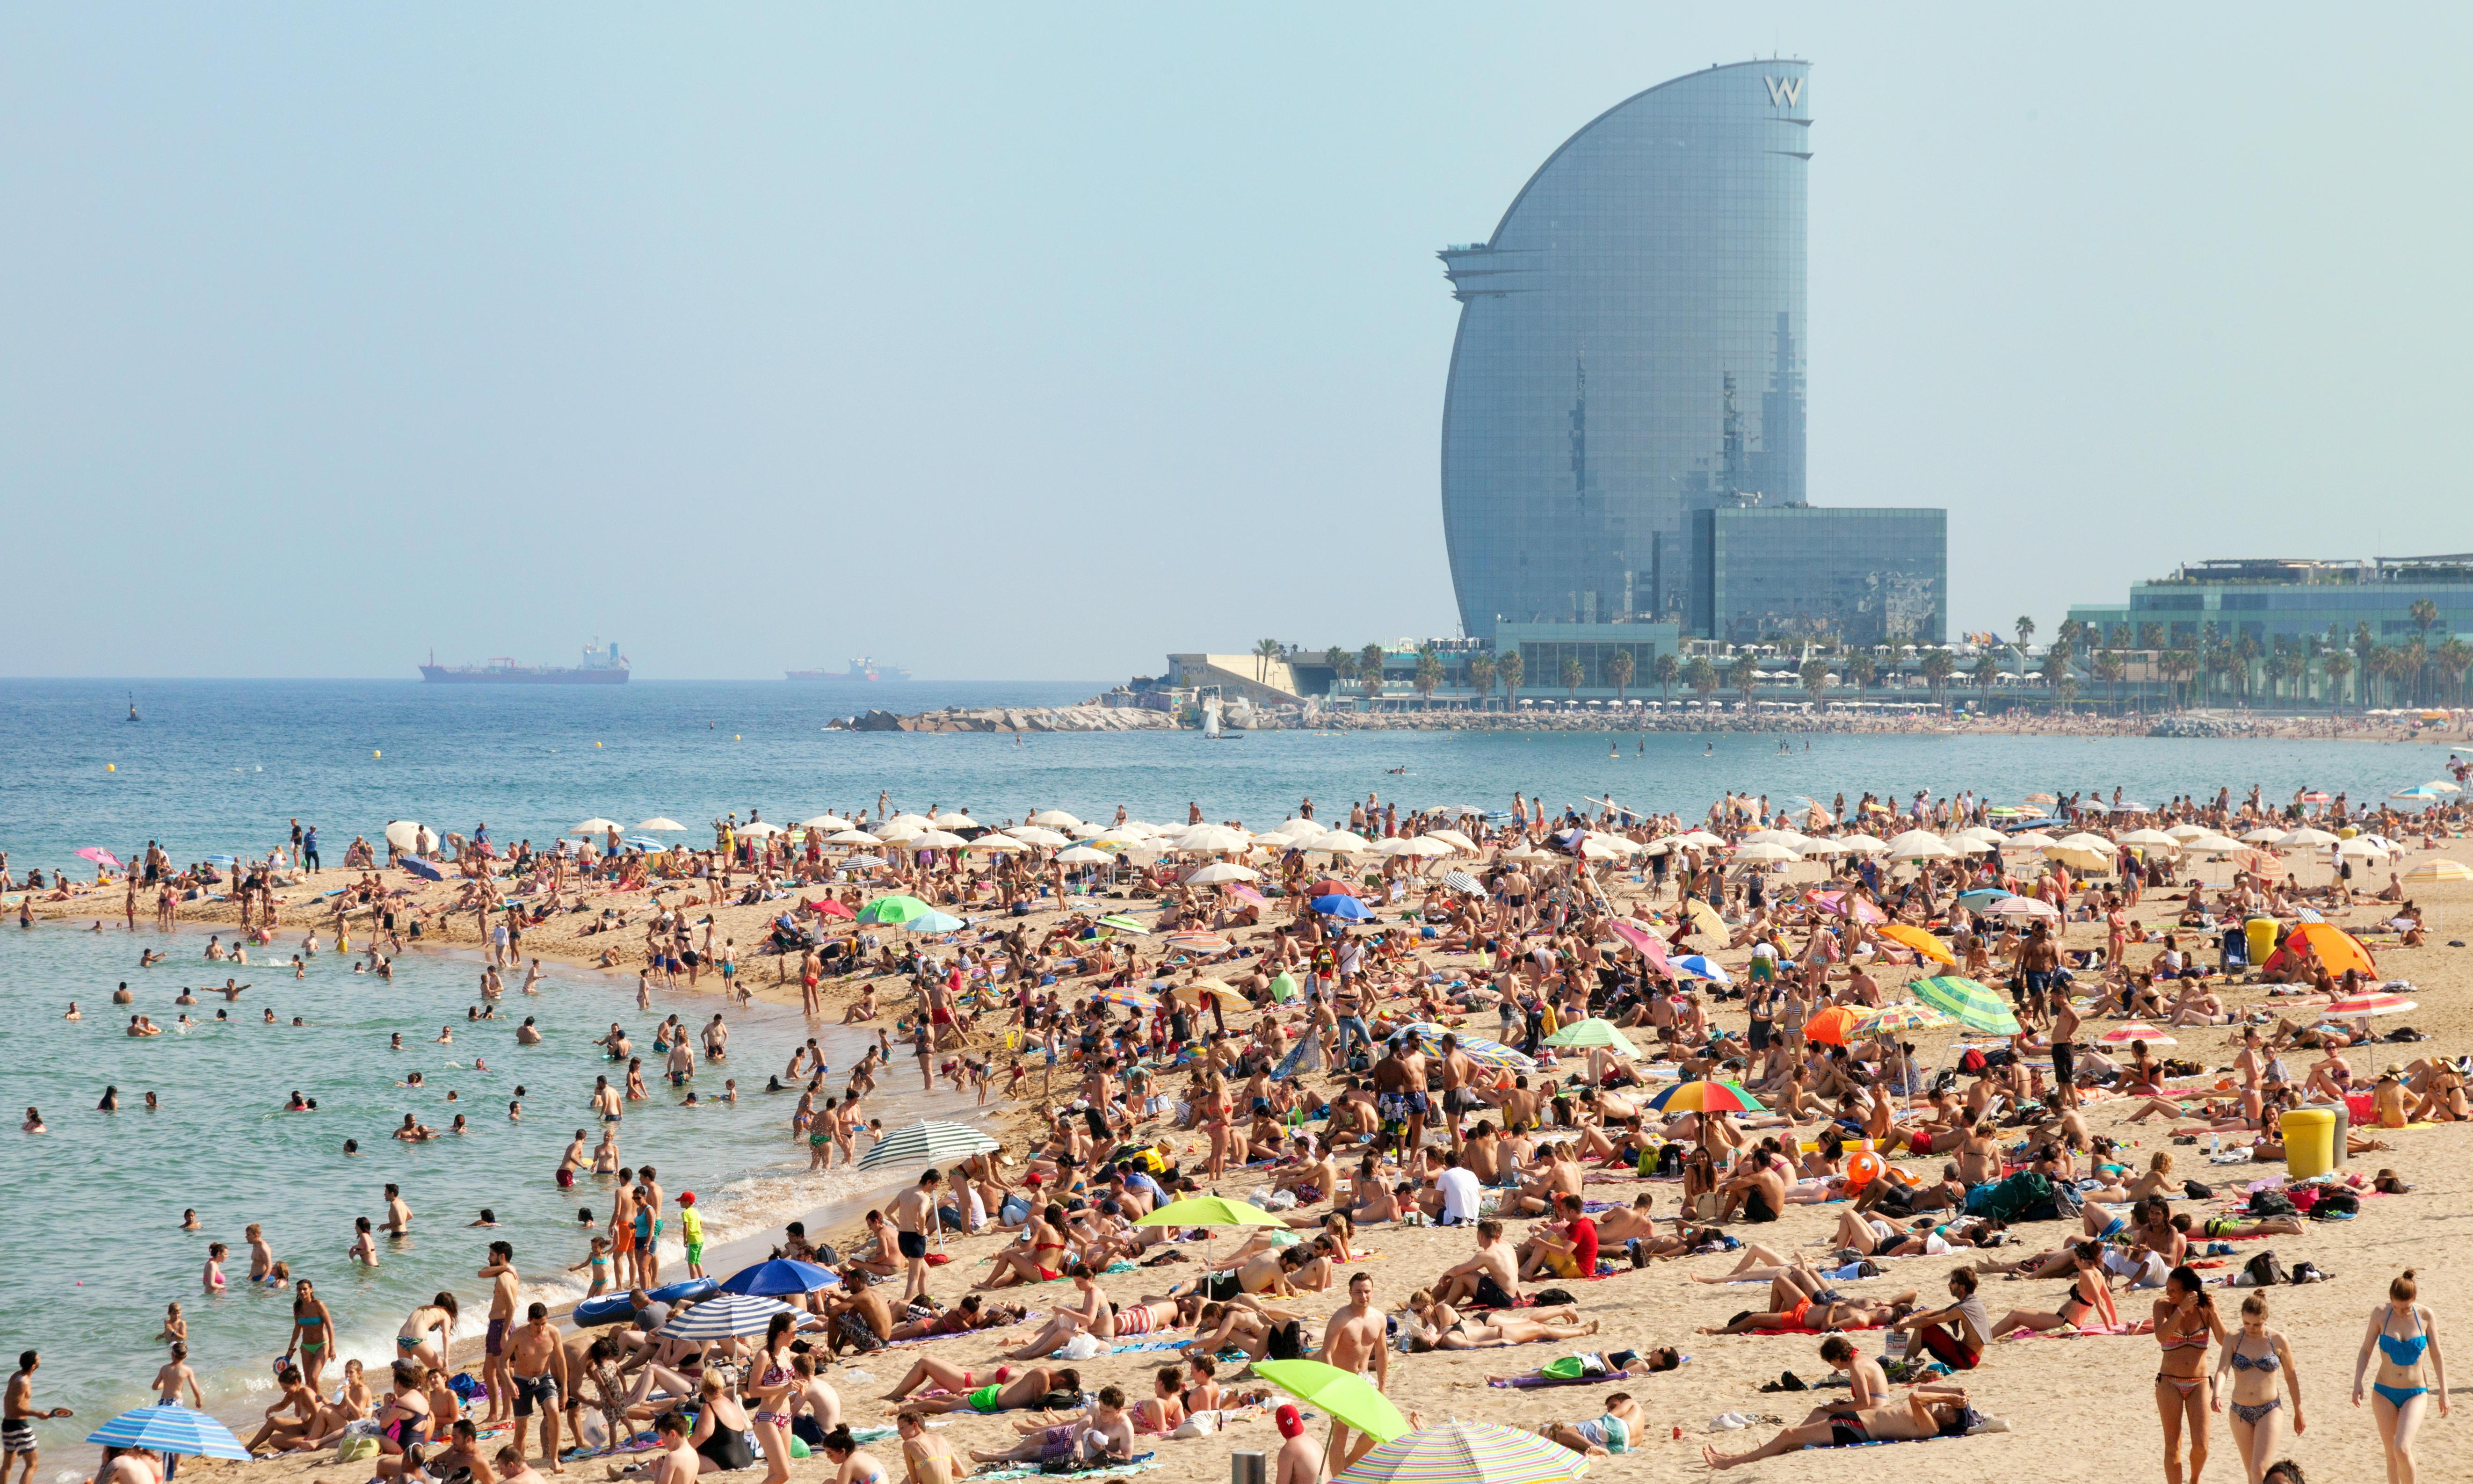 Environmental damage of tourism comes under MPs' spotlight